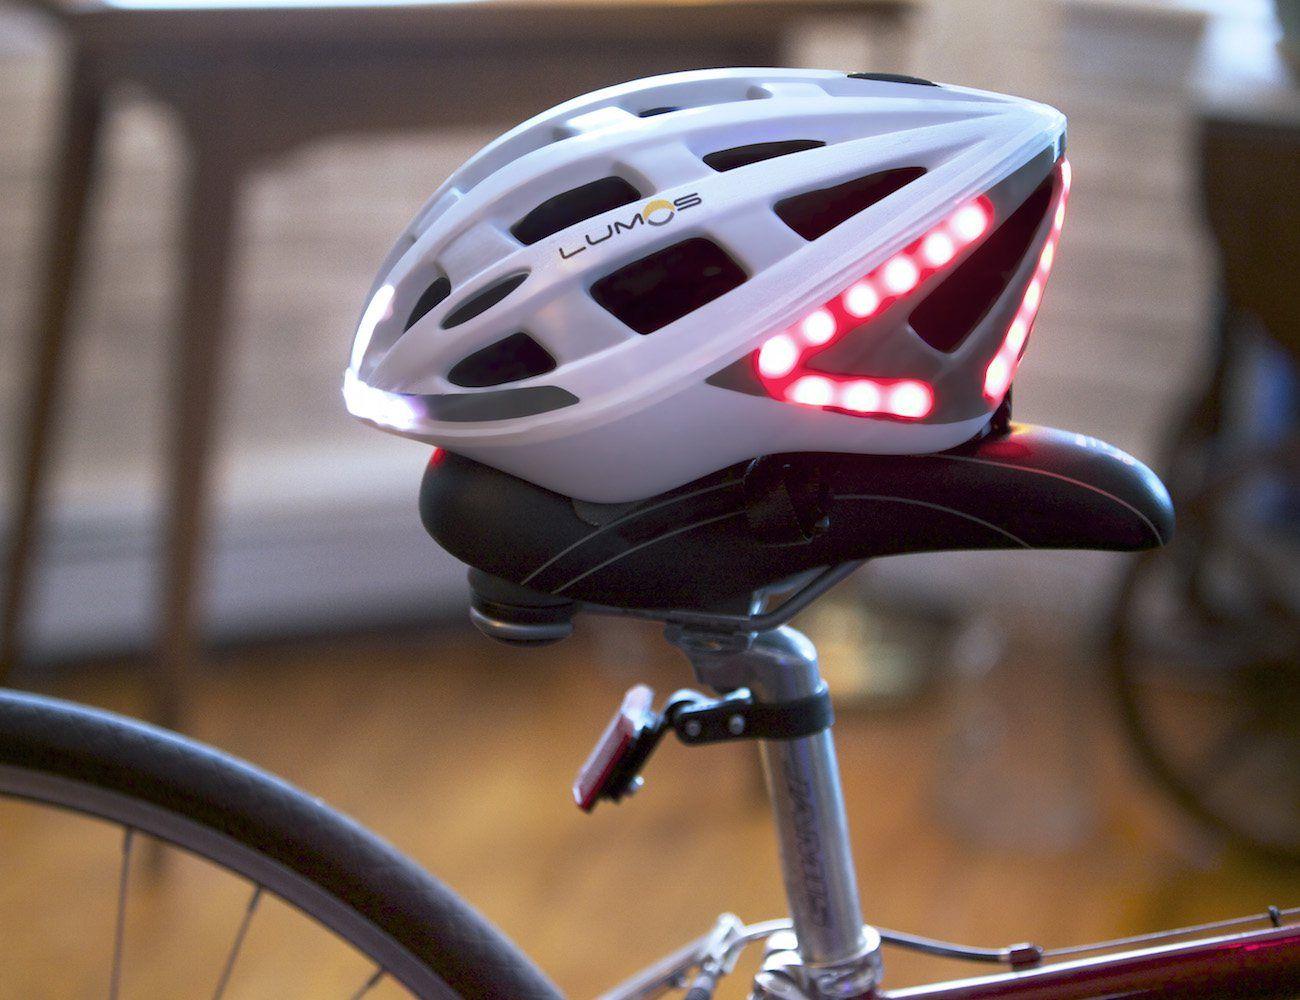 Lumos Next Generation Bicycle Helmet Http Thegadgetflow Com